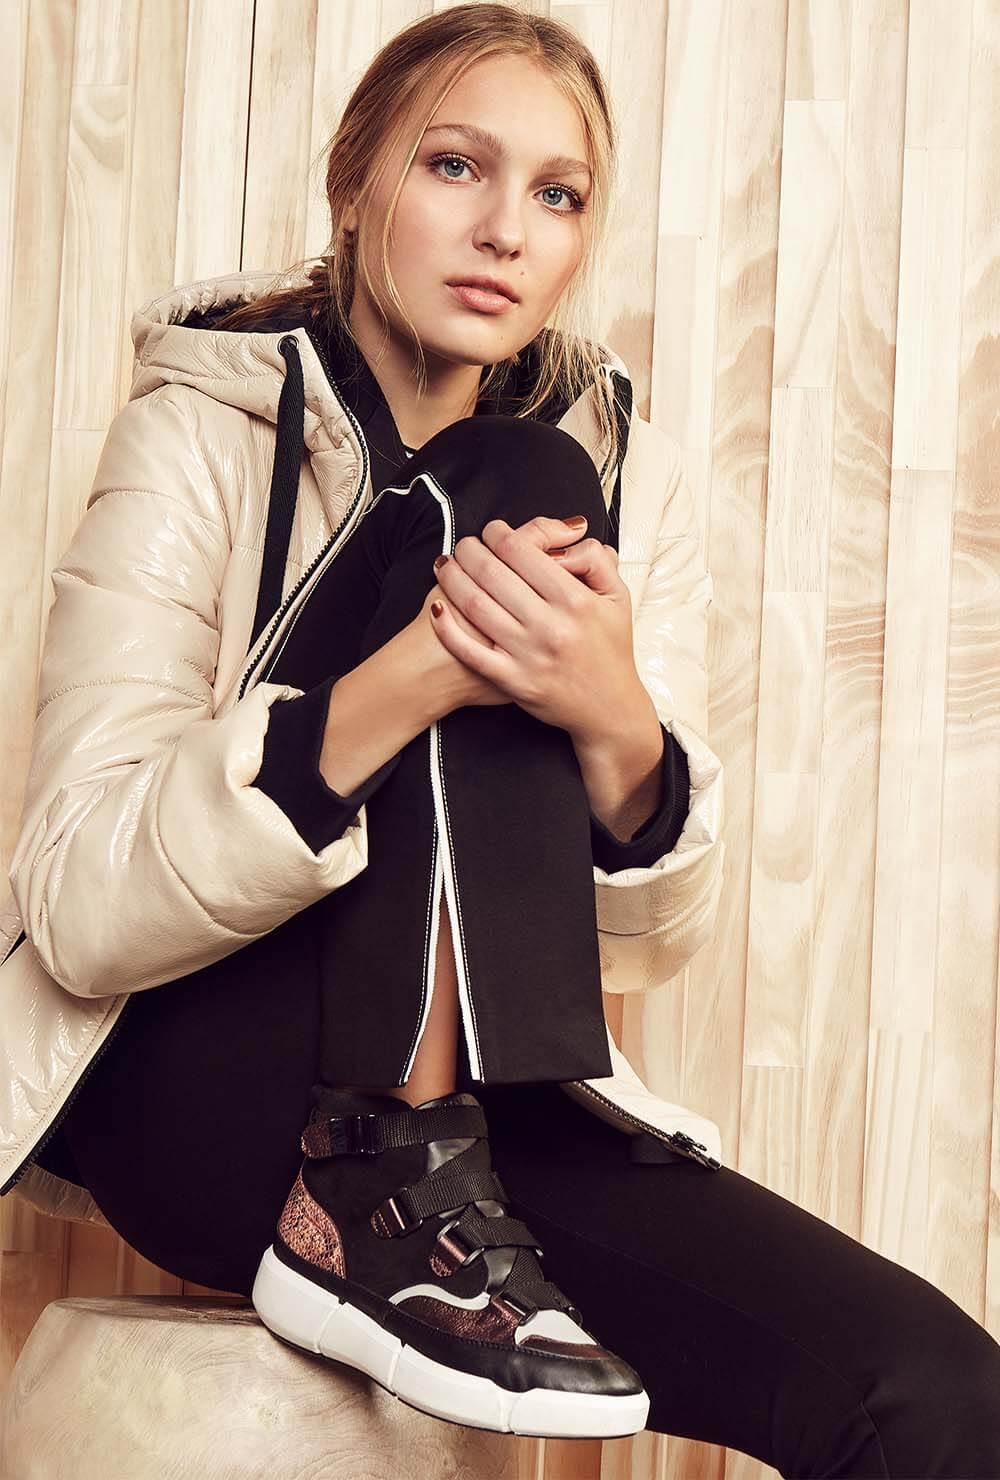 Camperas de invierno 2020 moda mujer. Moda otoño invierno 2020.